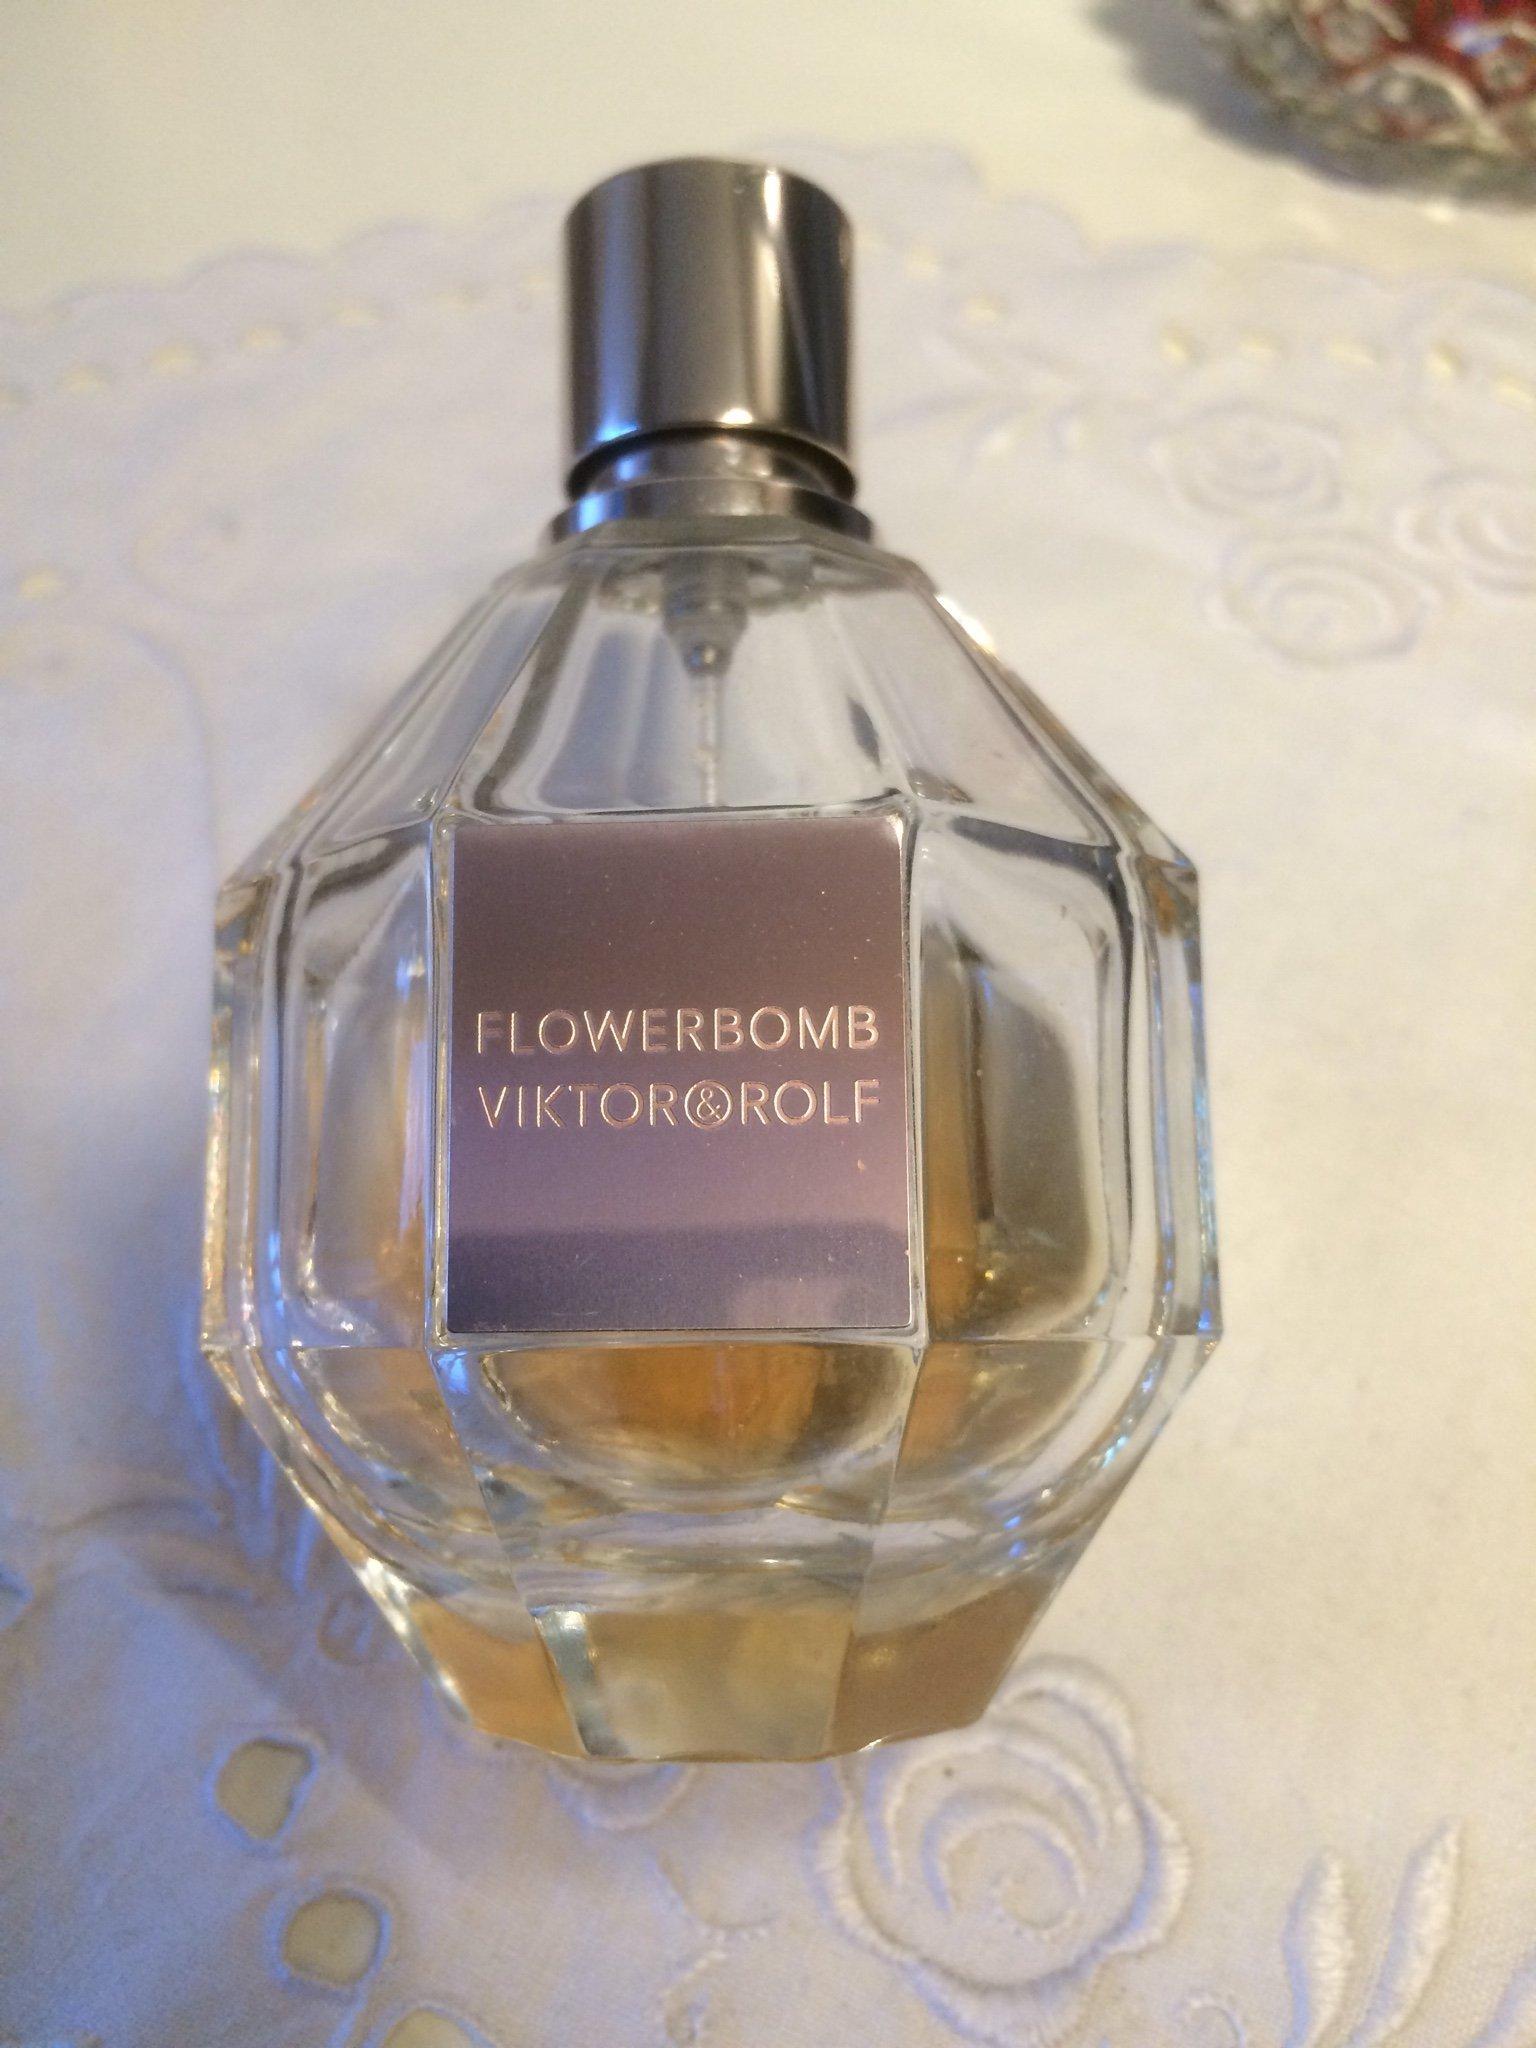 Eau de parfum Victor & Rolf Flowerbomb stora flaskan